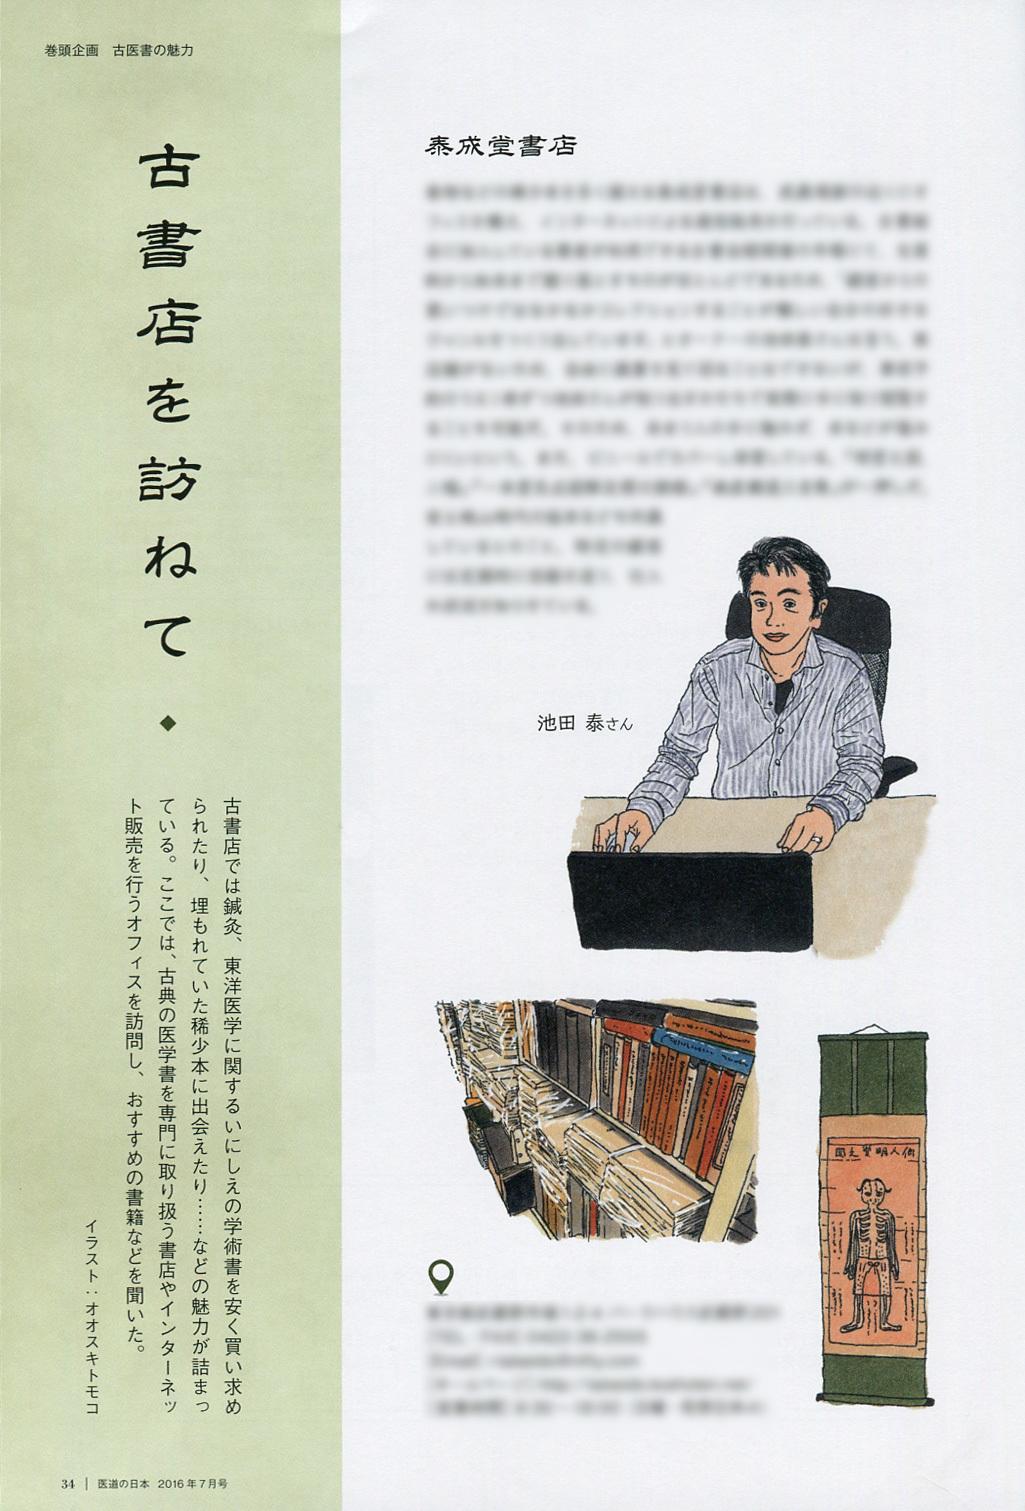 「月刊 医道の日本」(医道の日本社) 2016年7月号 「古書店の魅力」_f0134538_15524829.jpg